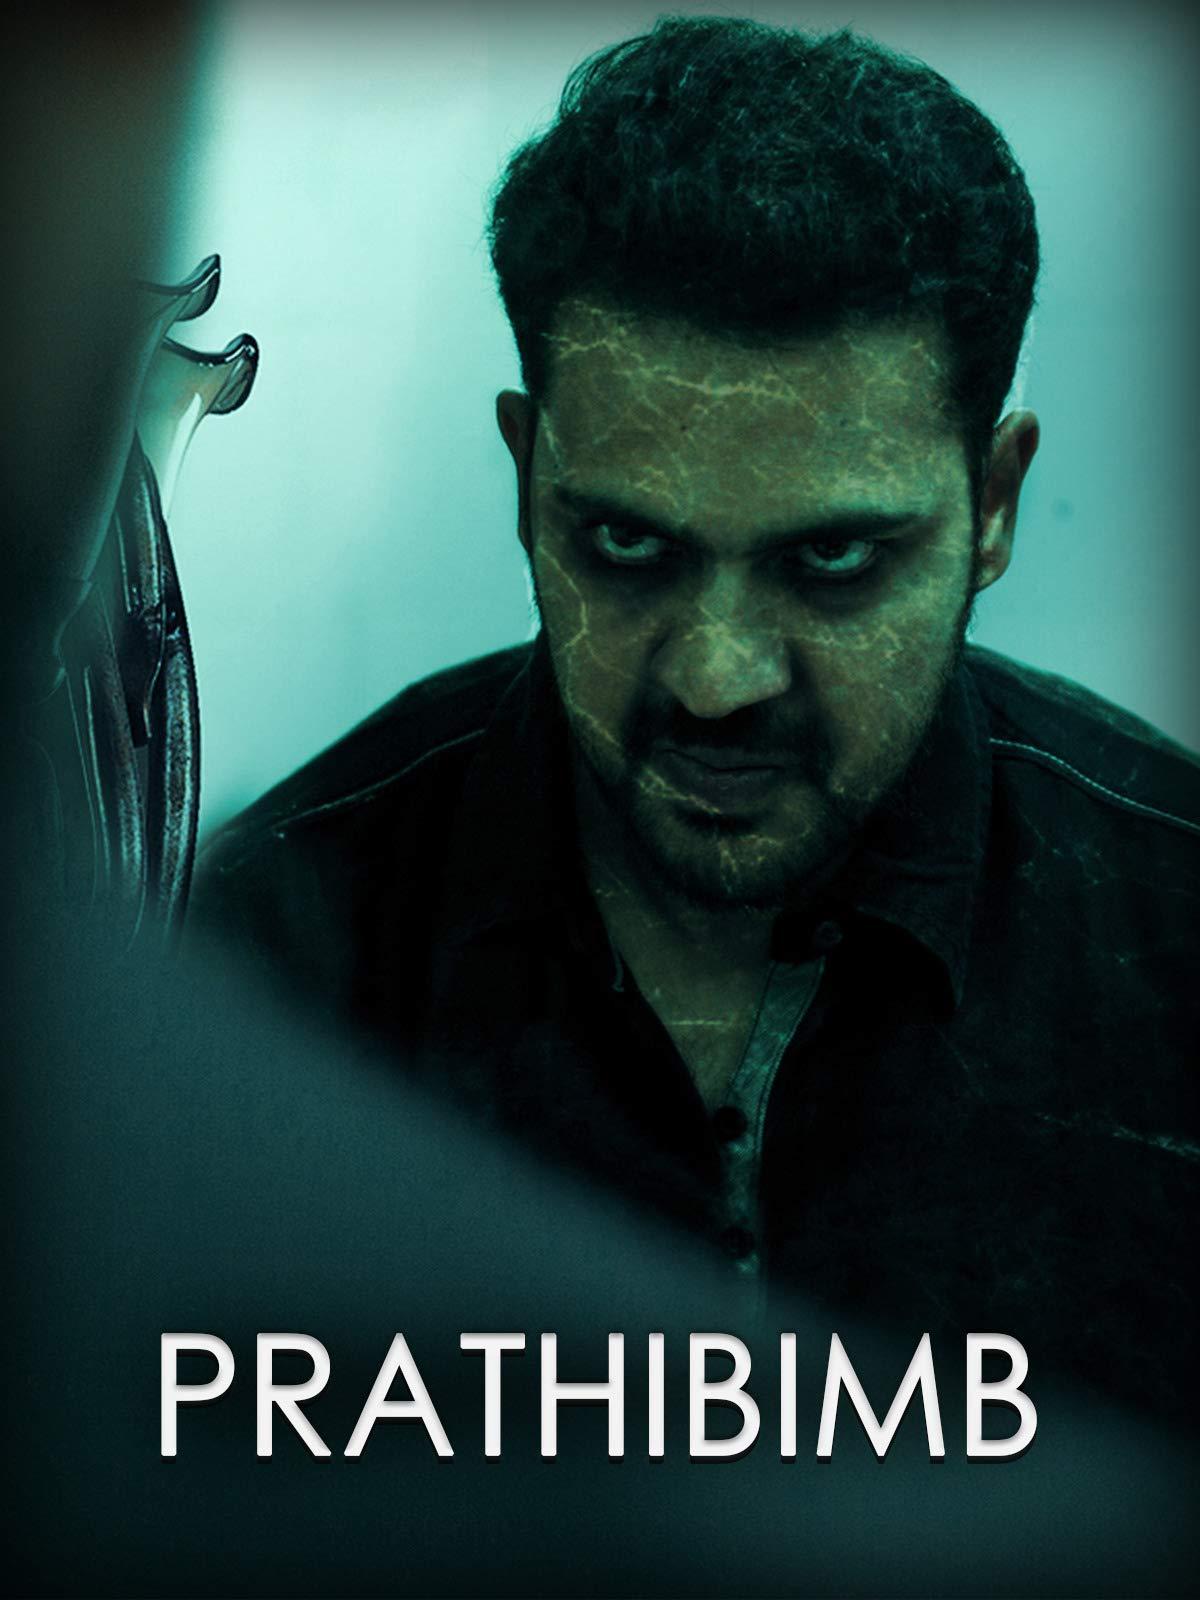 Prathibimb